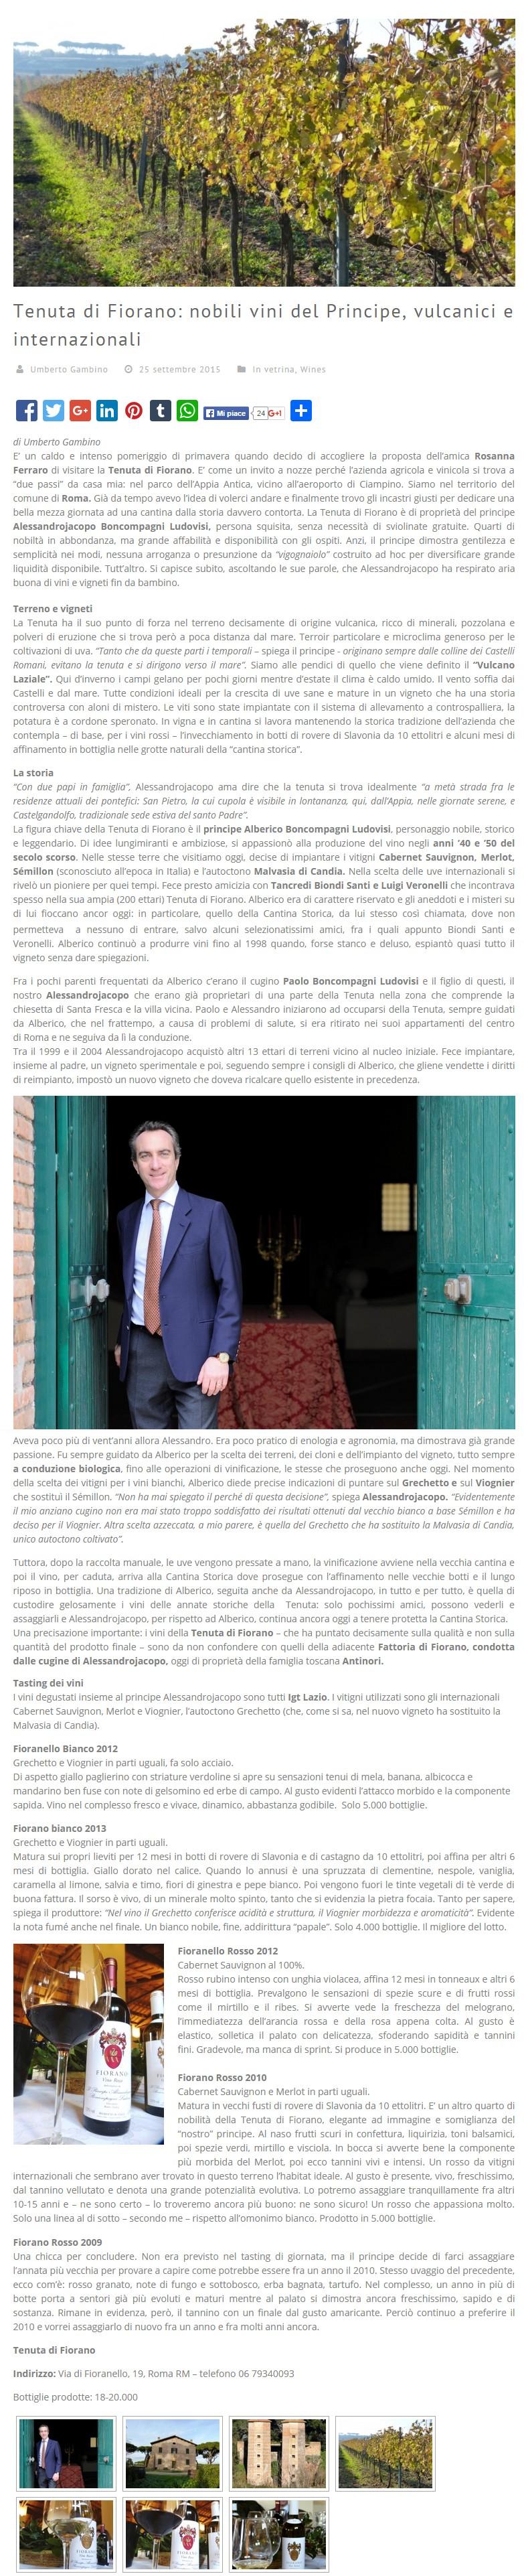 Rassegna stampa 2015 - Wining.it